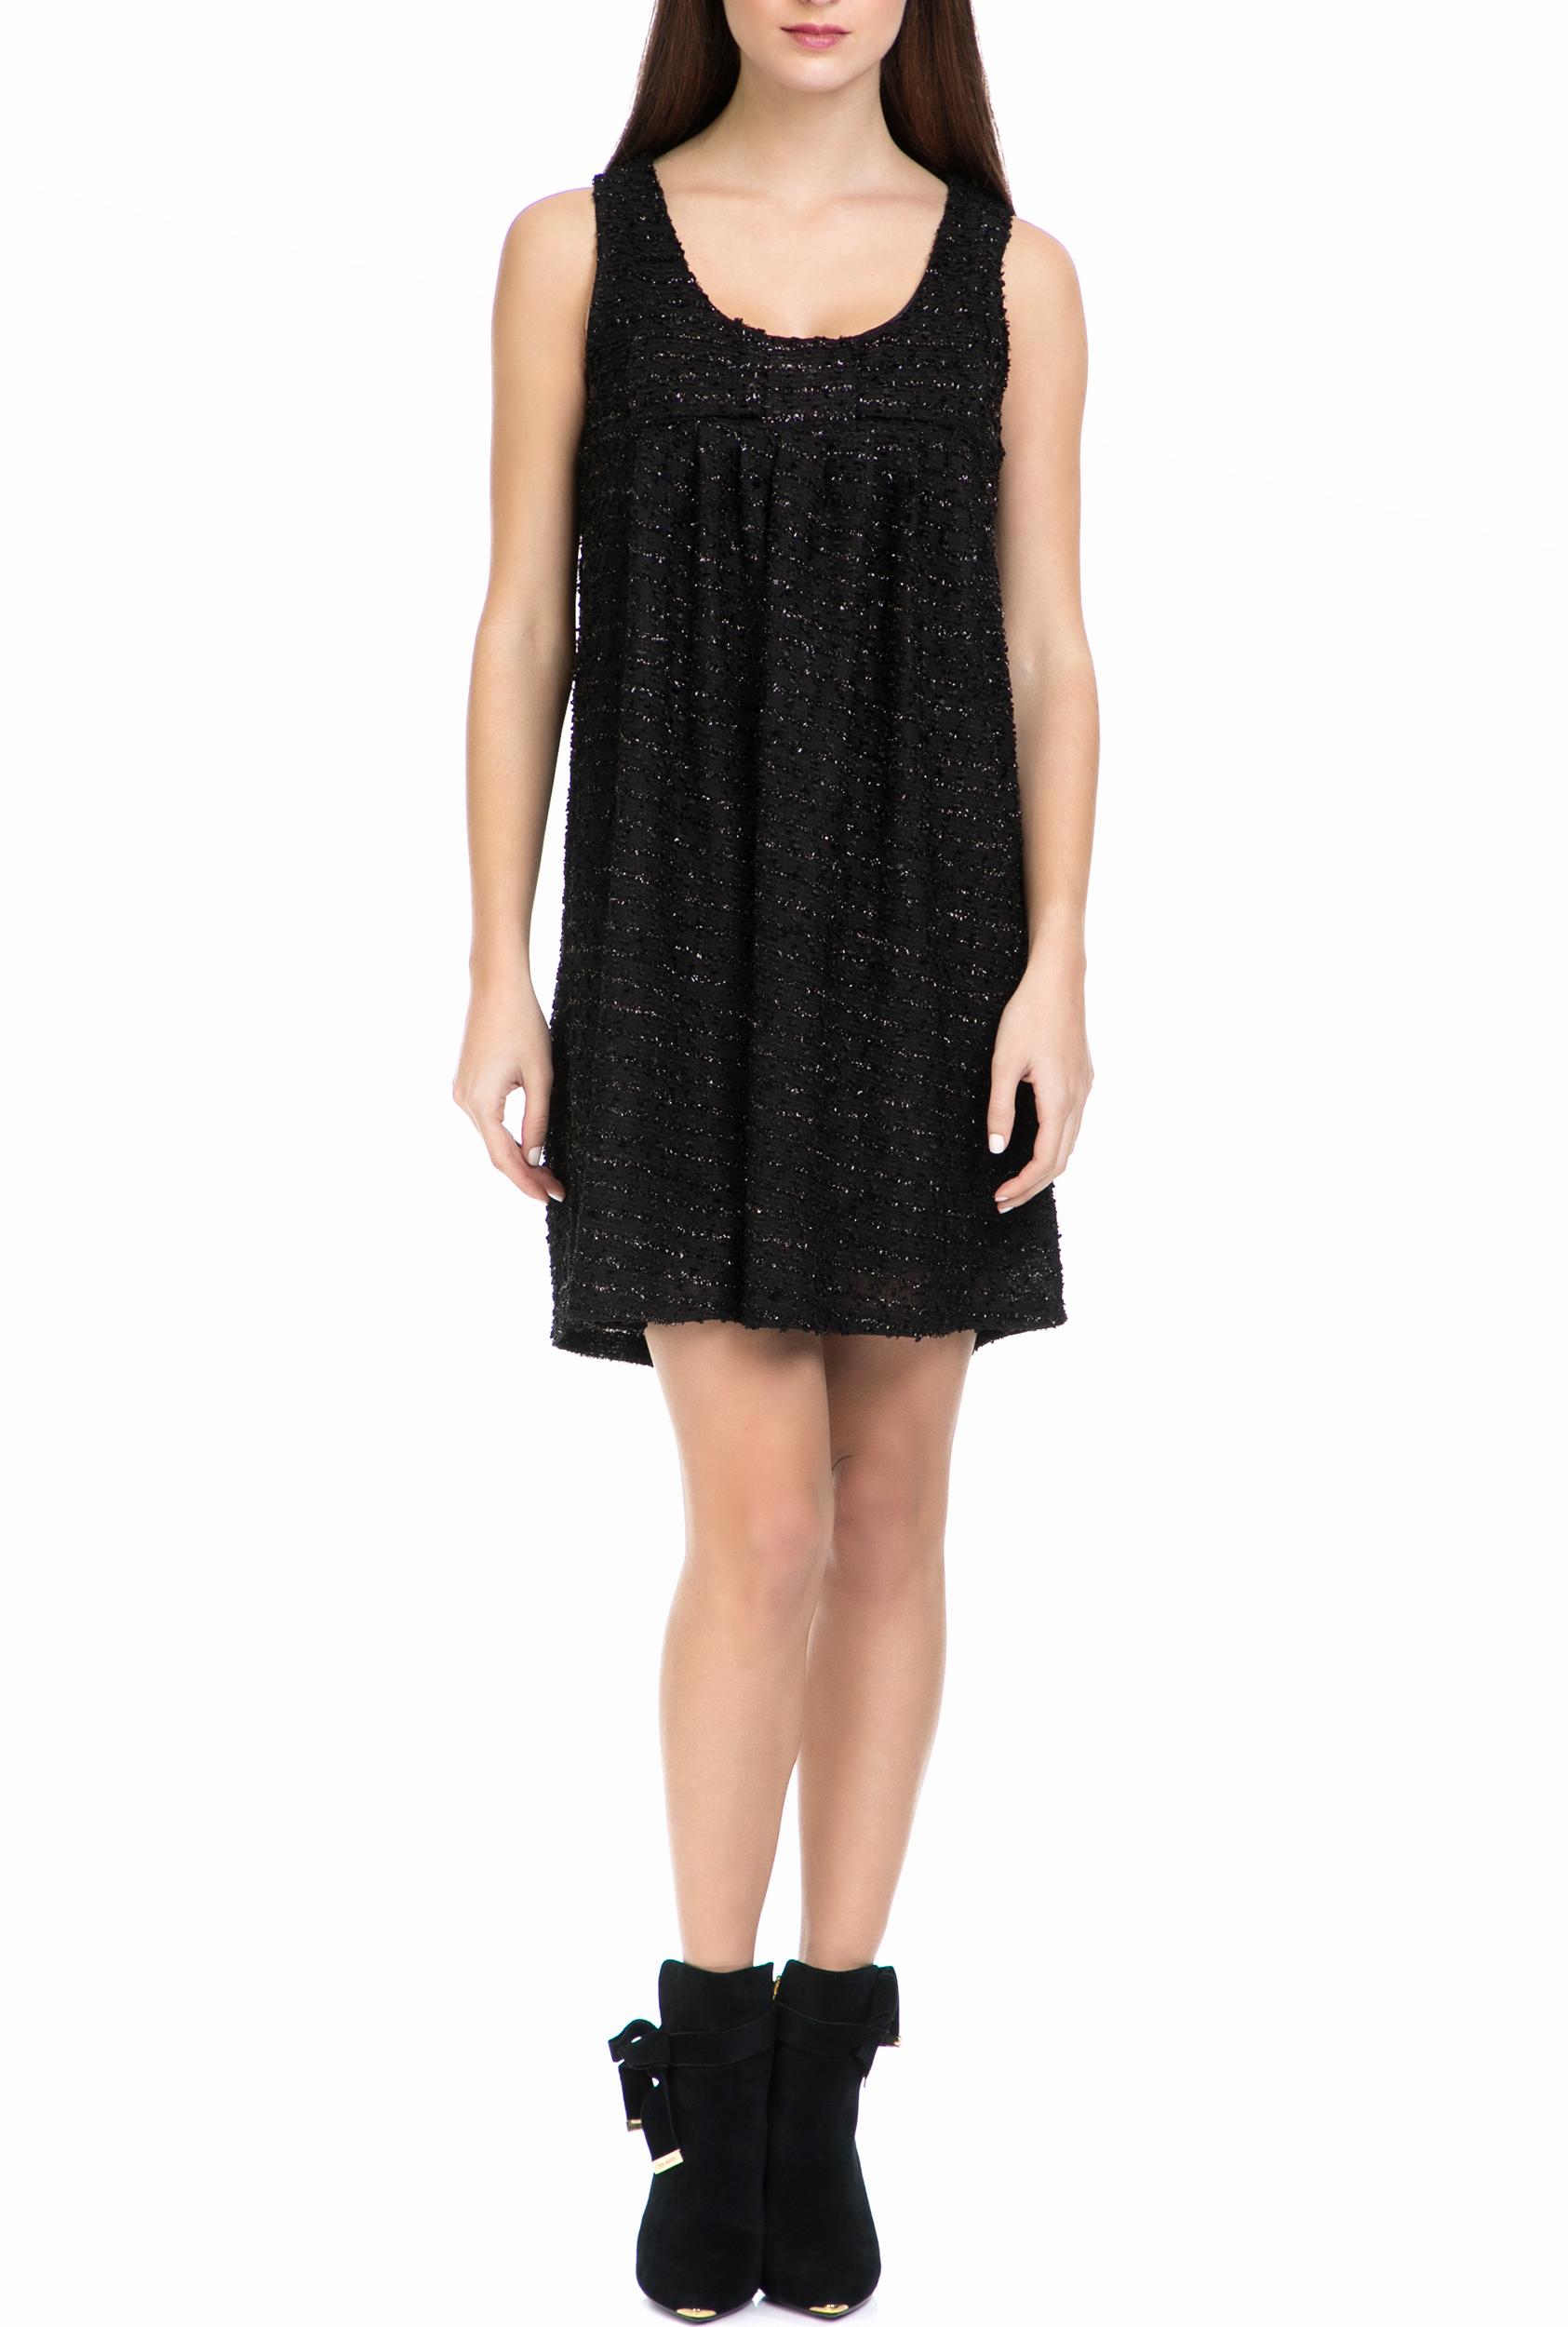 MOLLY BRACKEN - Γυναικείο φόρεμα MOLLY BRACKEN μαύρο